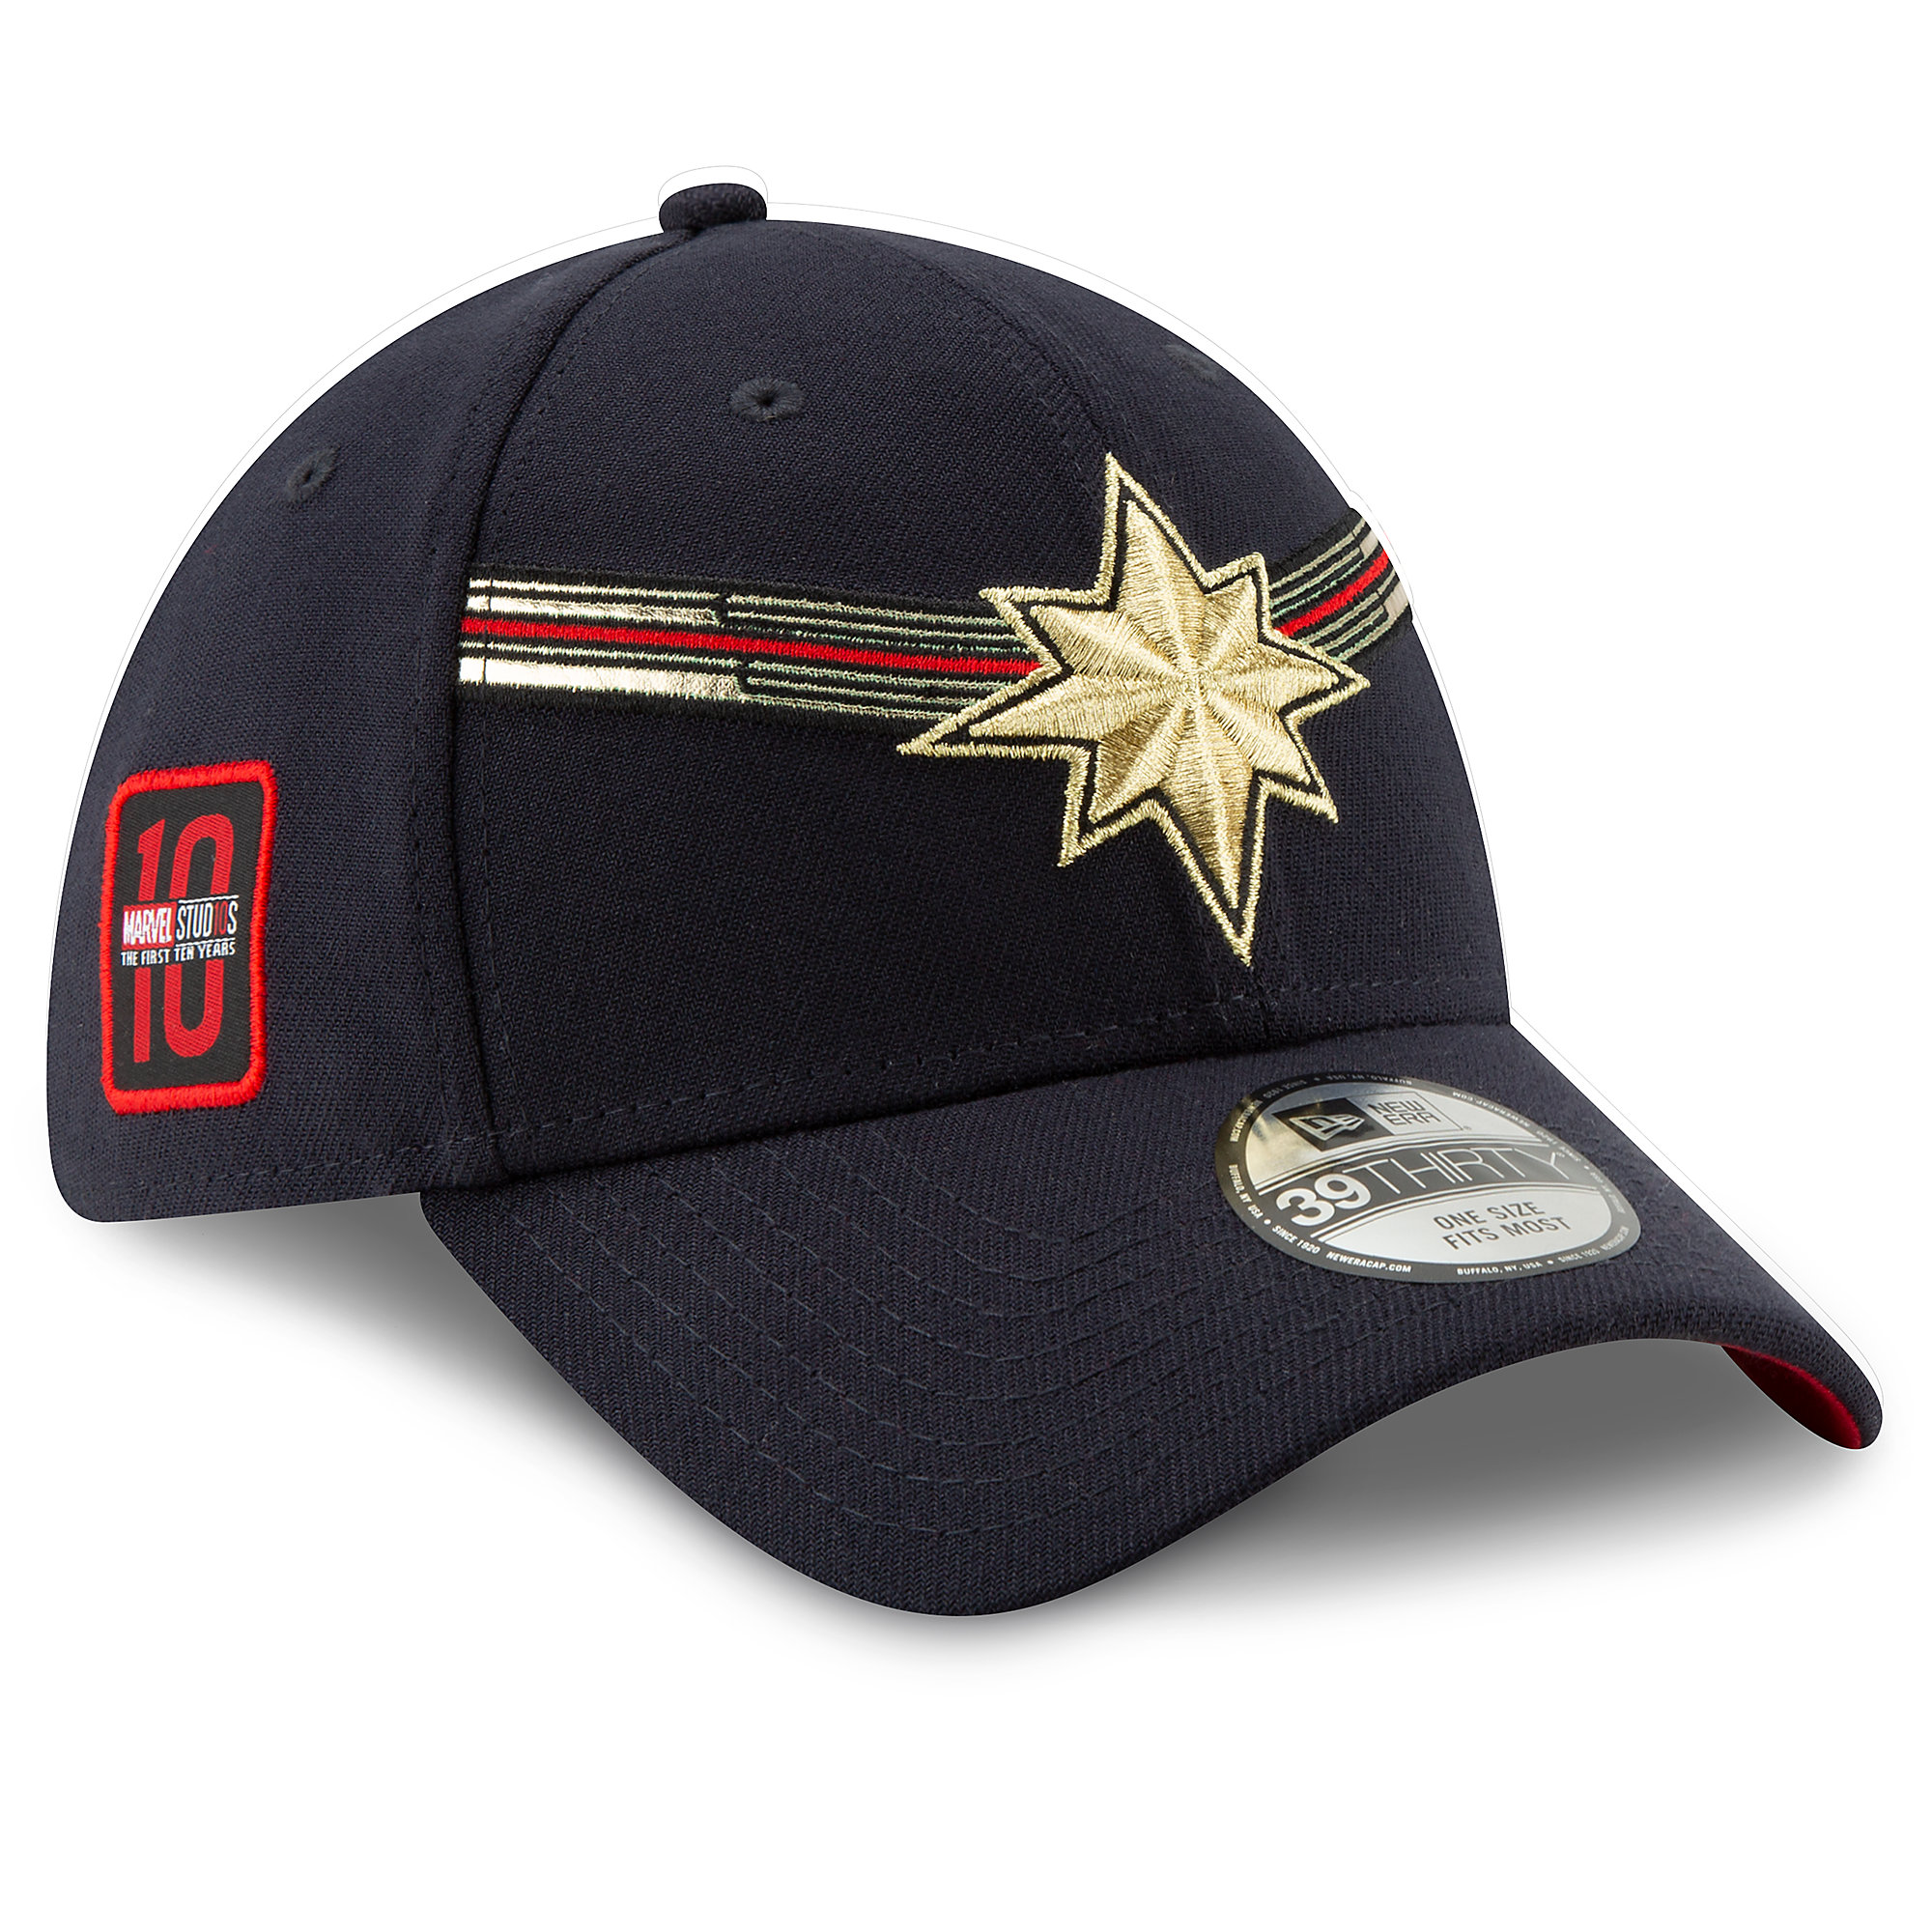 25 30 Anniversary Cap: Marvel's Captain Marvel Baseball Cap For Adults By New Era